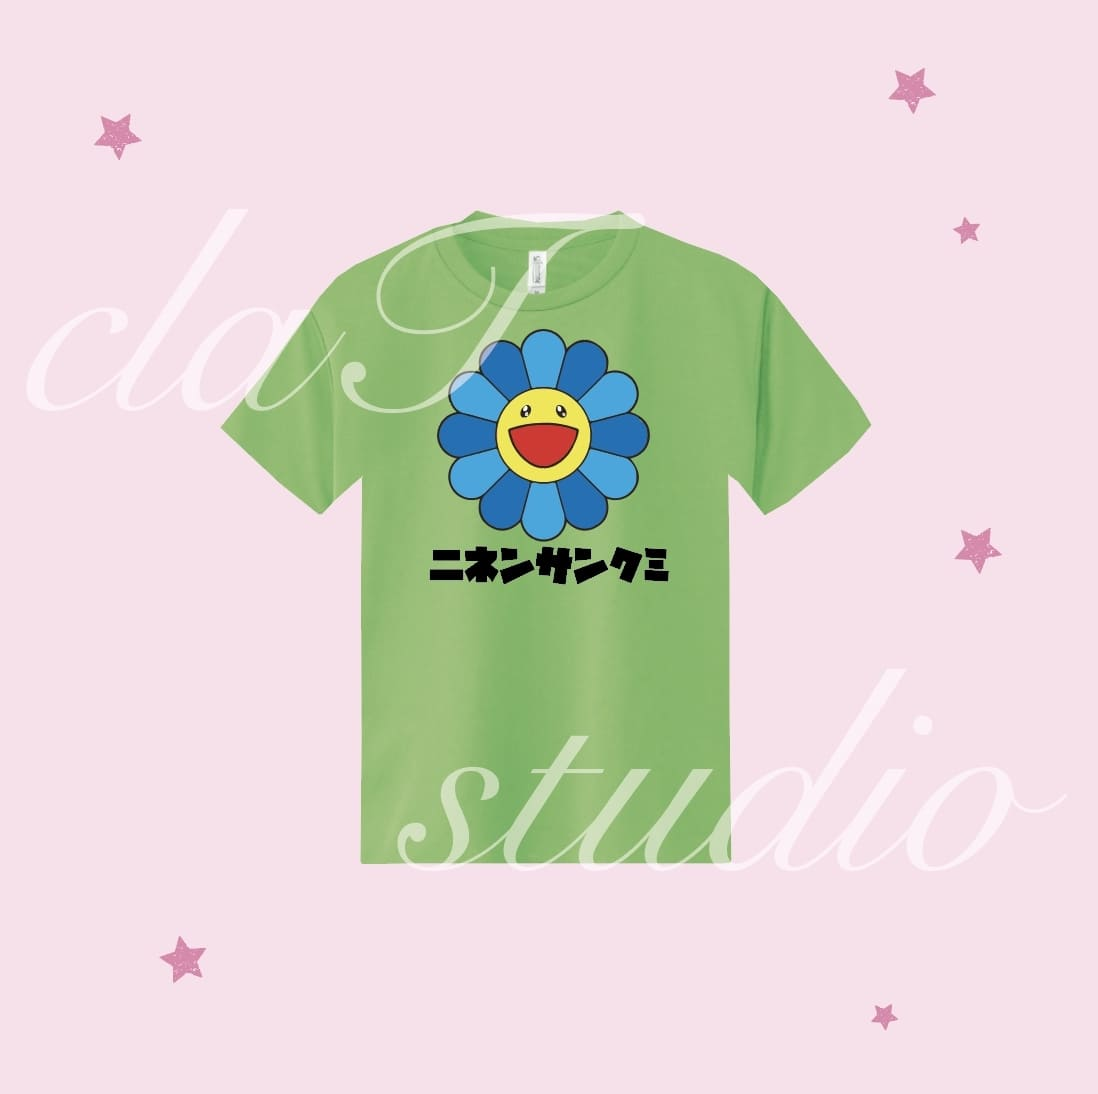 村上隆_design_0003